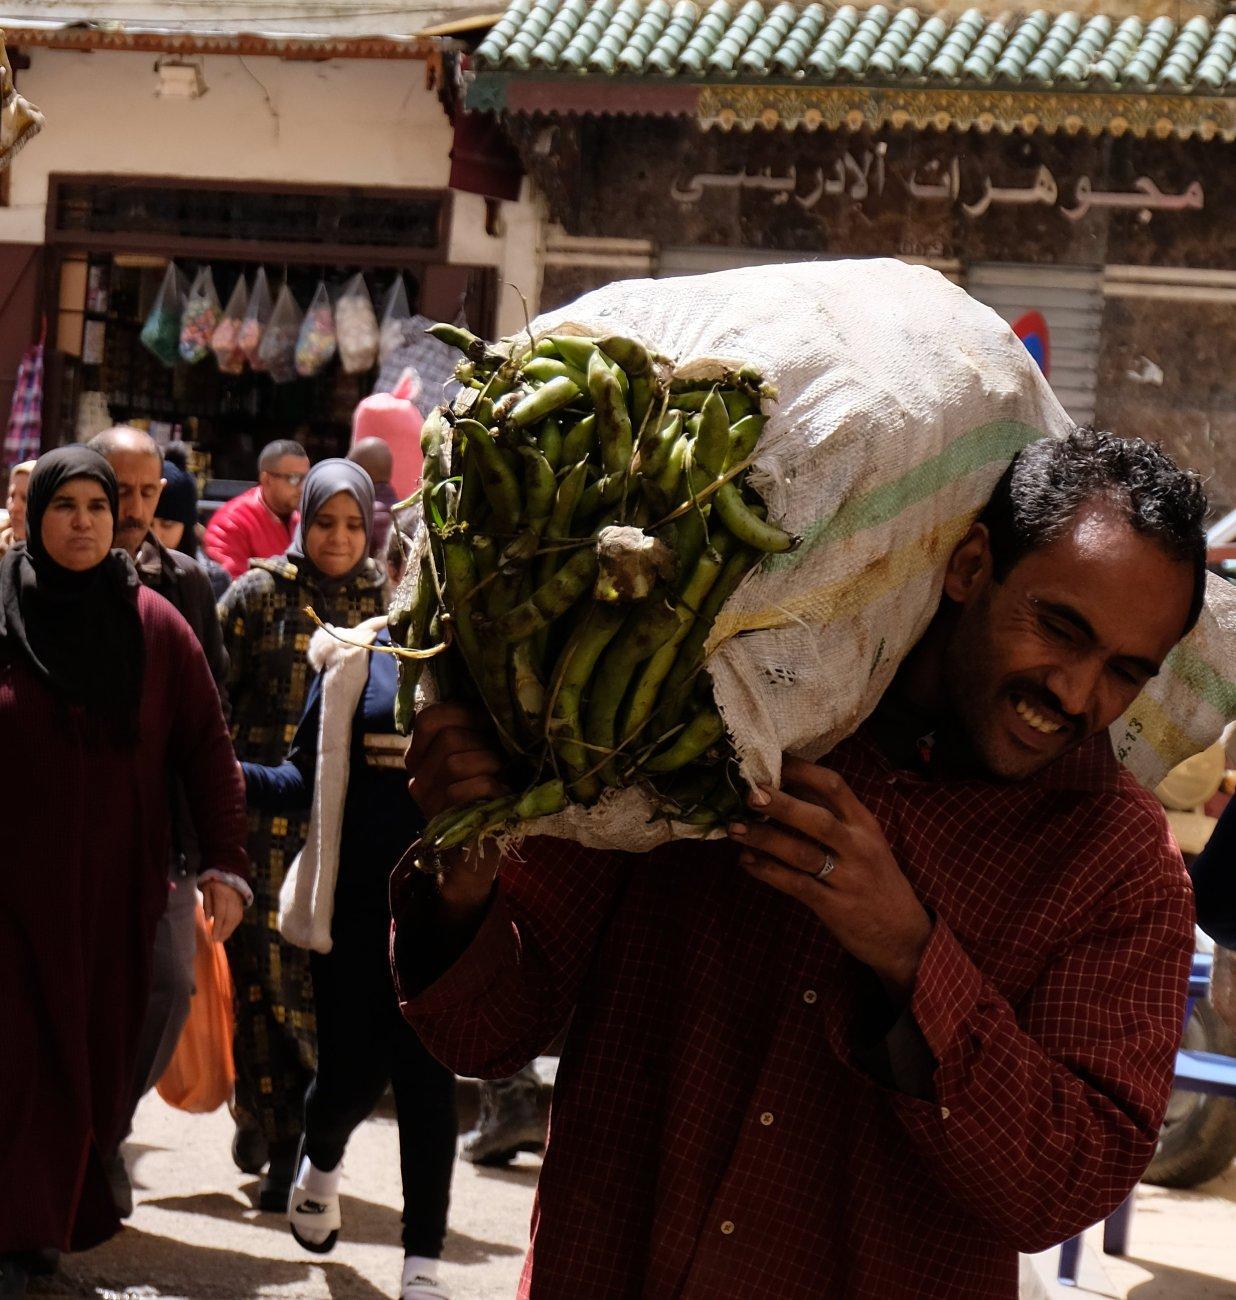 Working Men (2), Fez